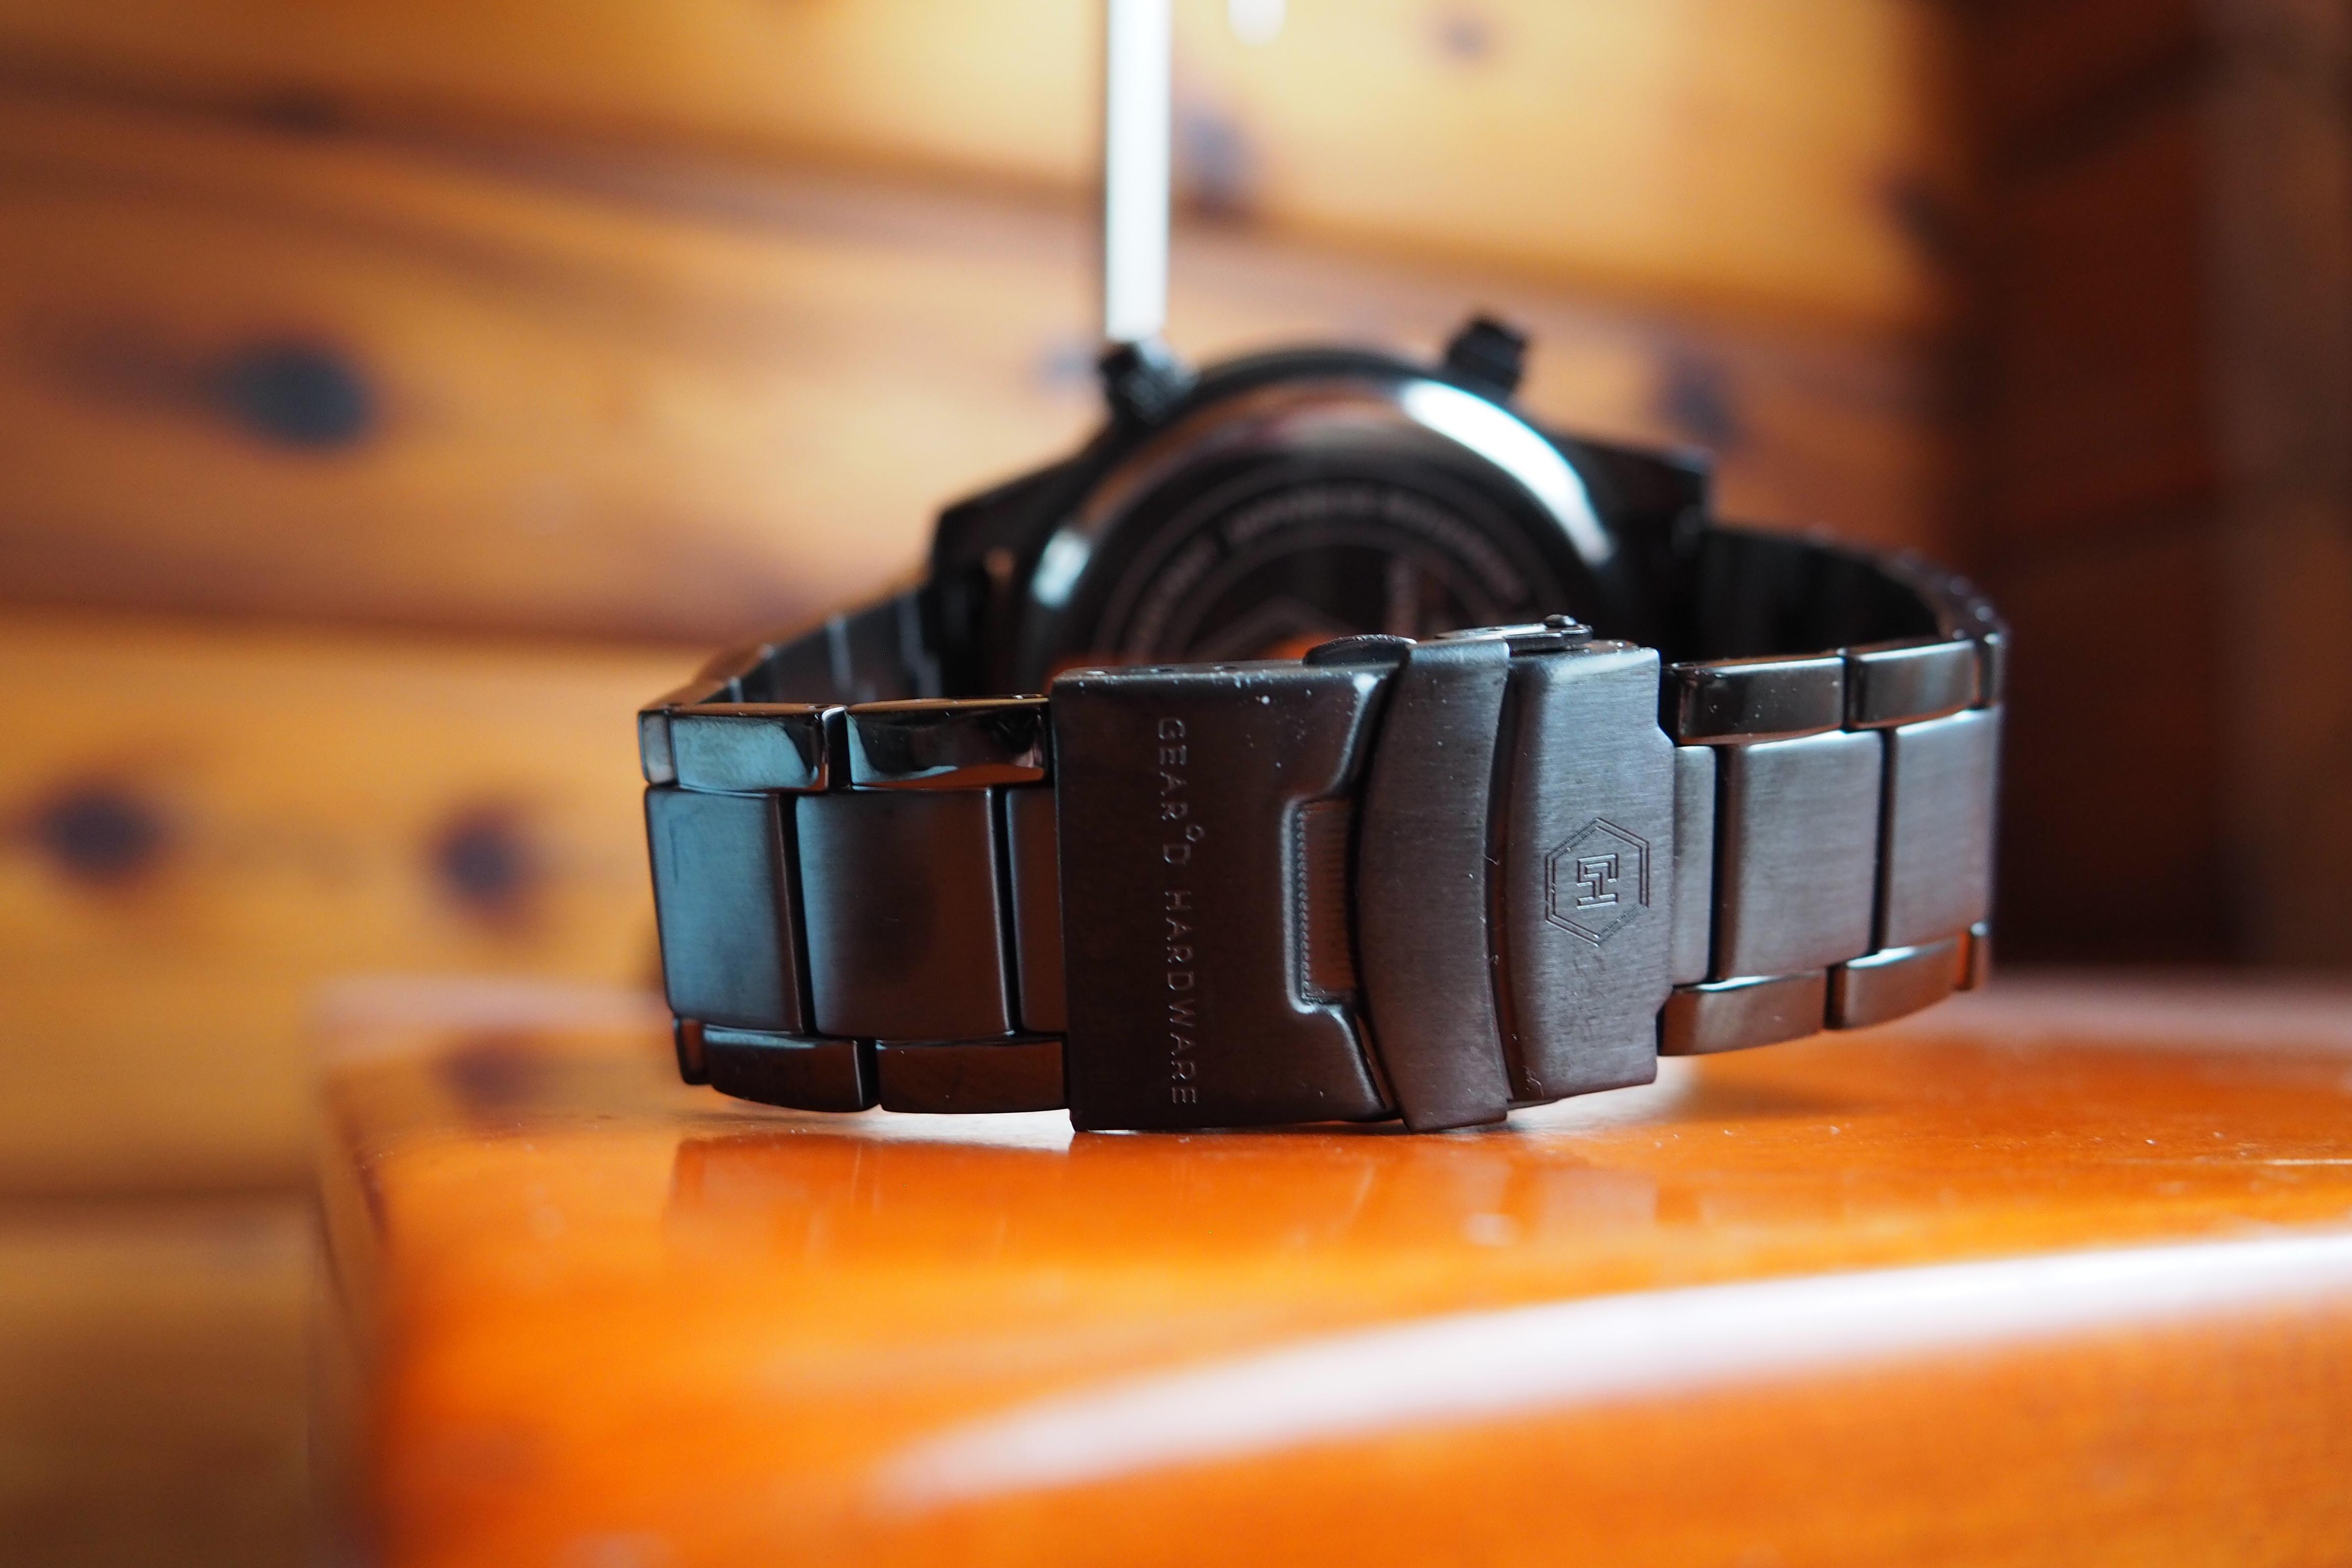 flimsy bracelet and clasp